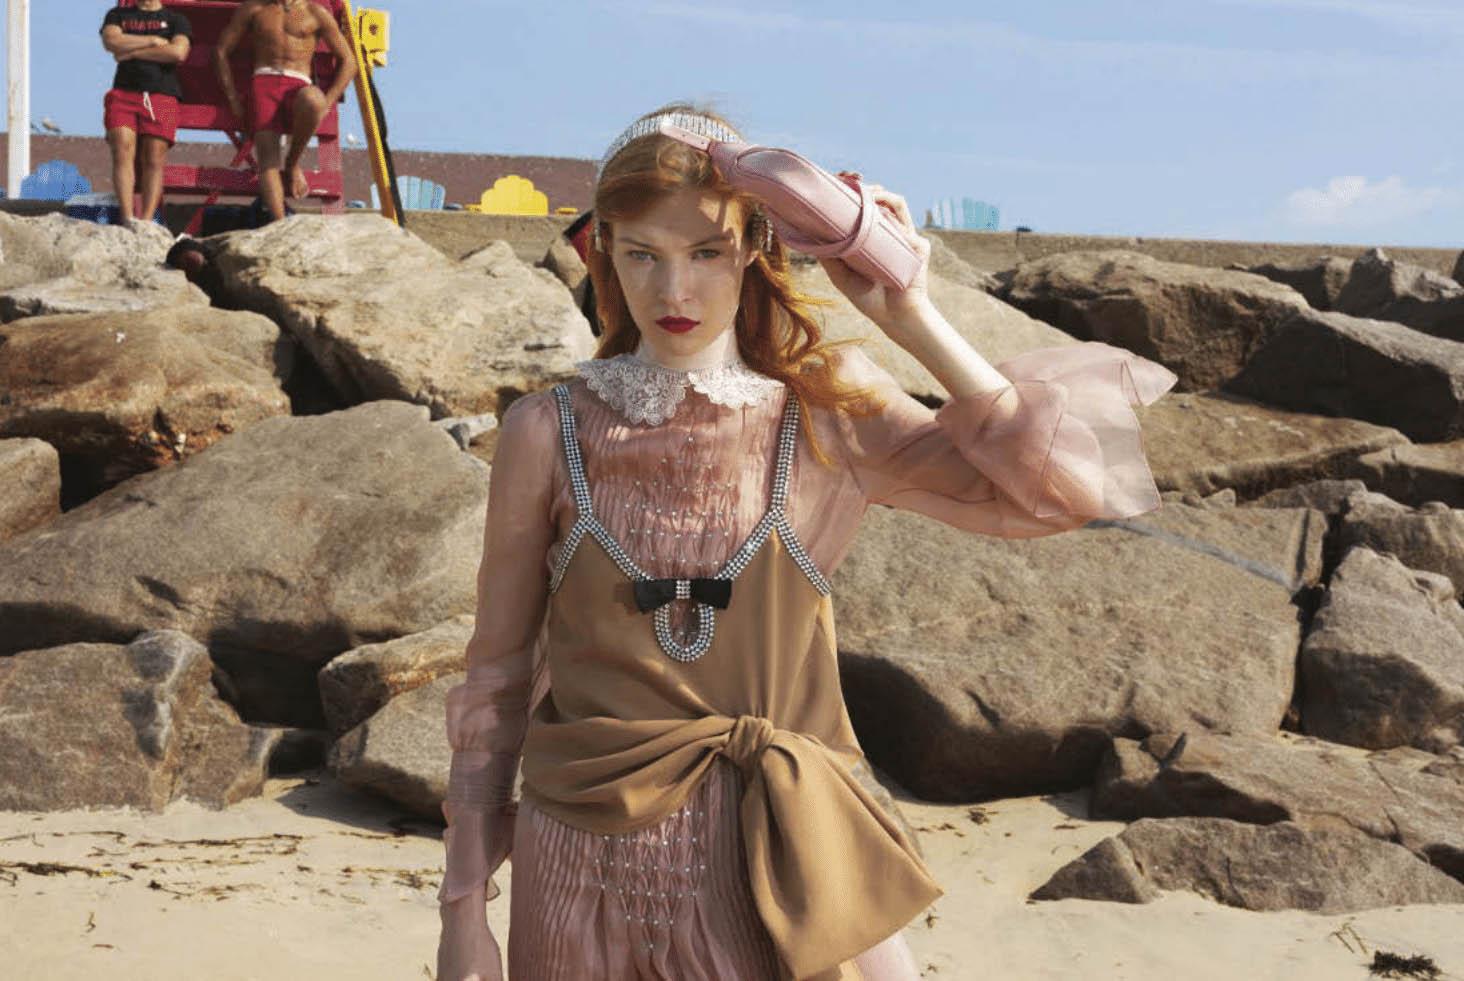 Remington Williams by Tina Barney for Vogue Italia September 2020